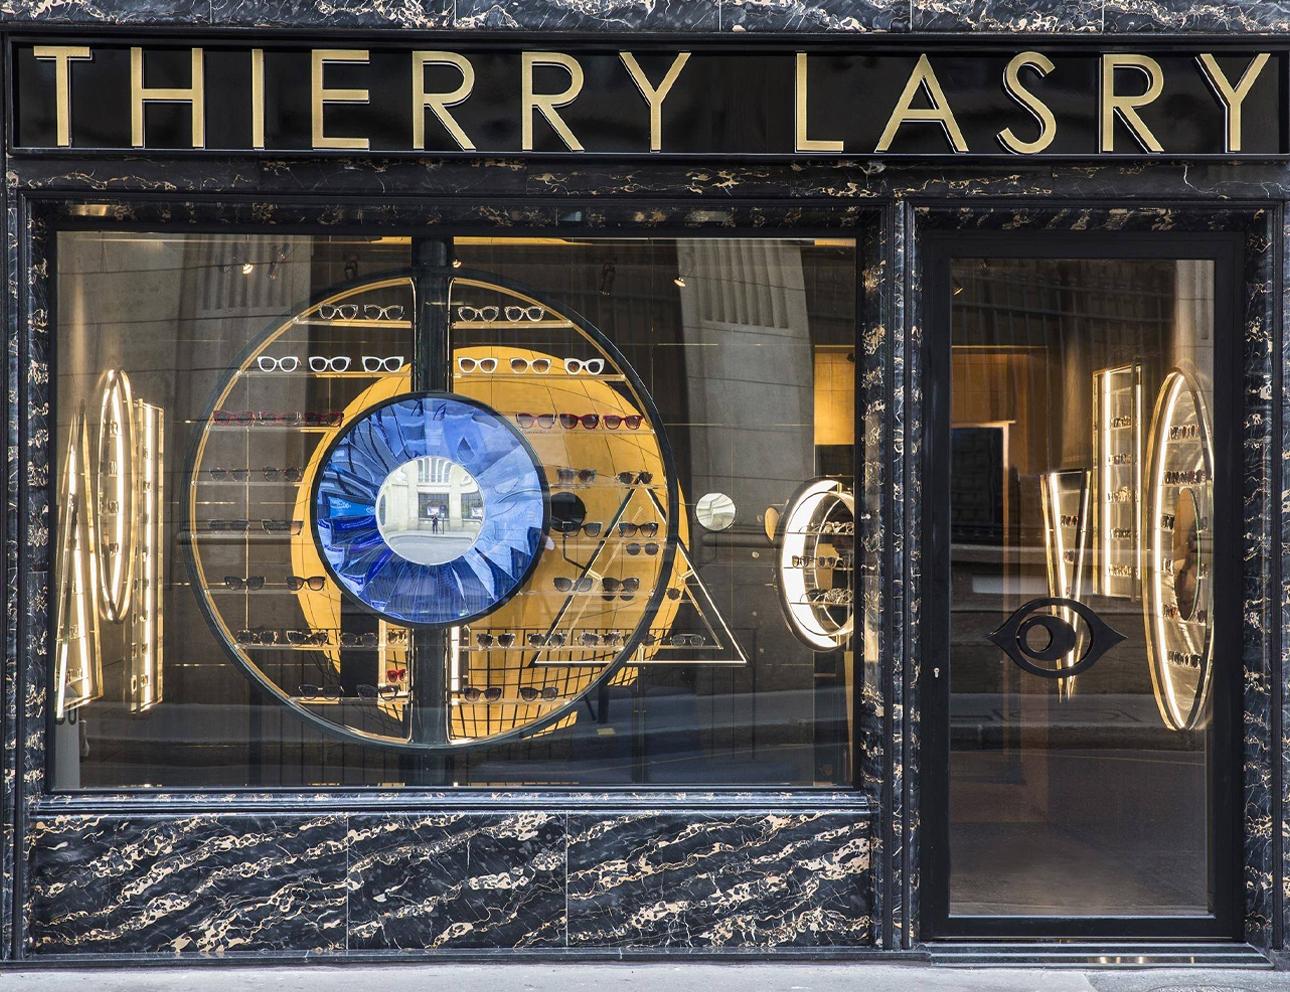 Thierry Lasry Paris